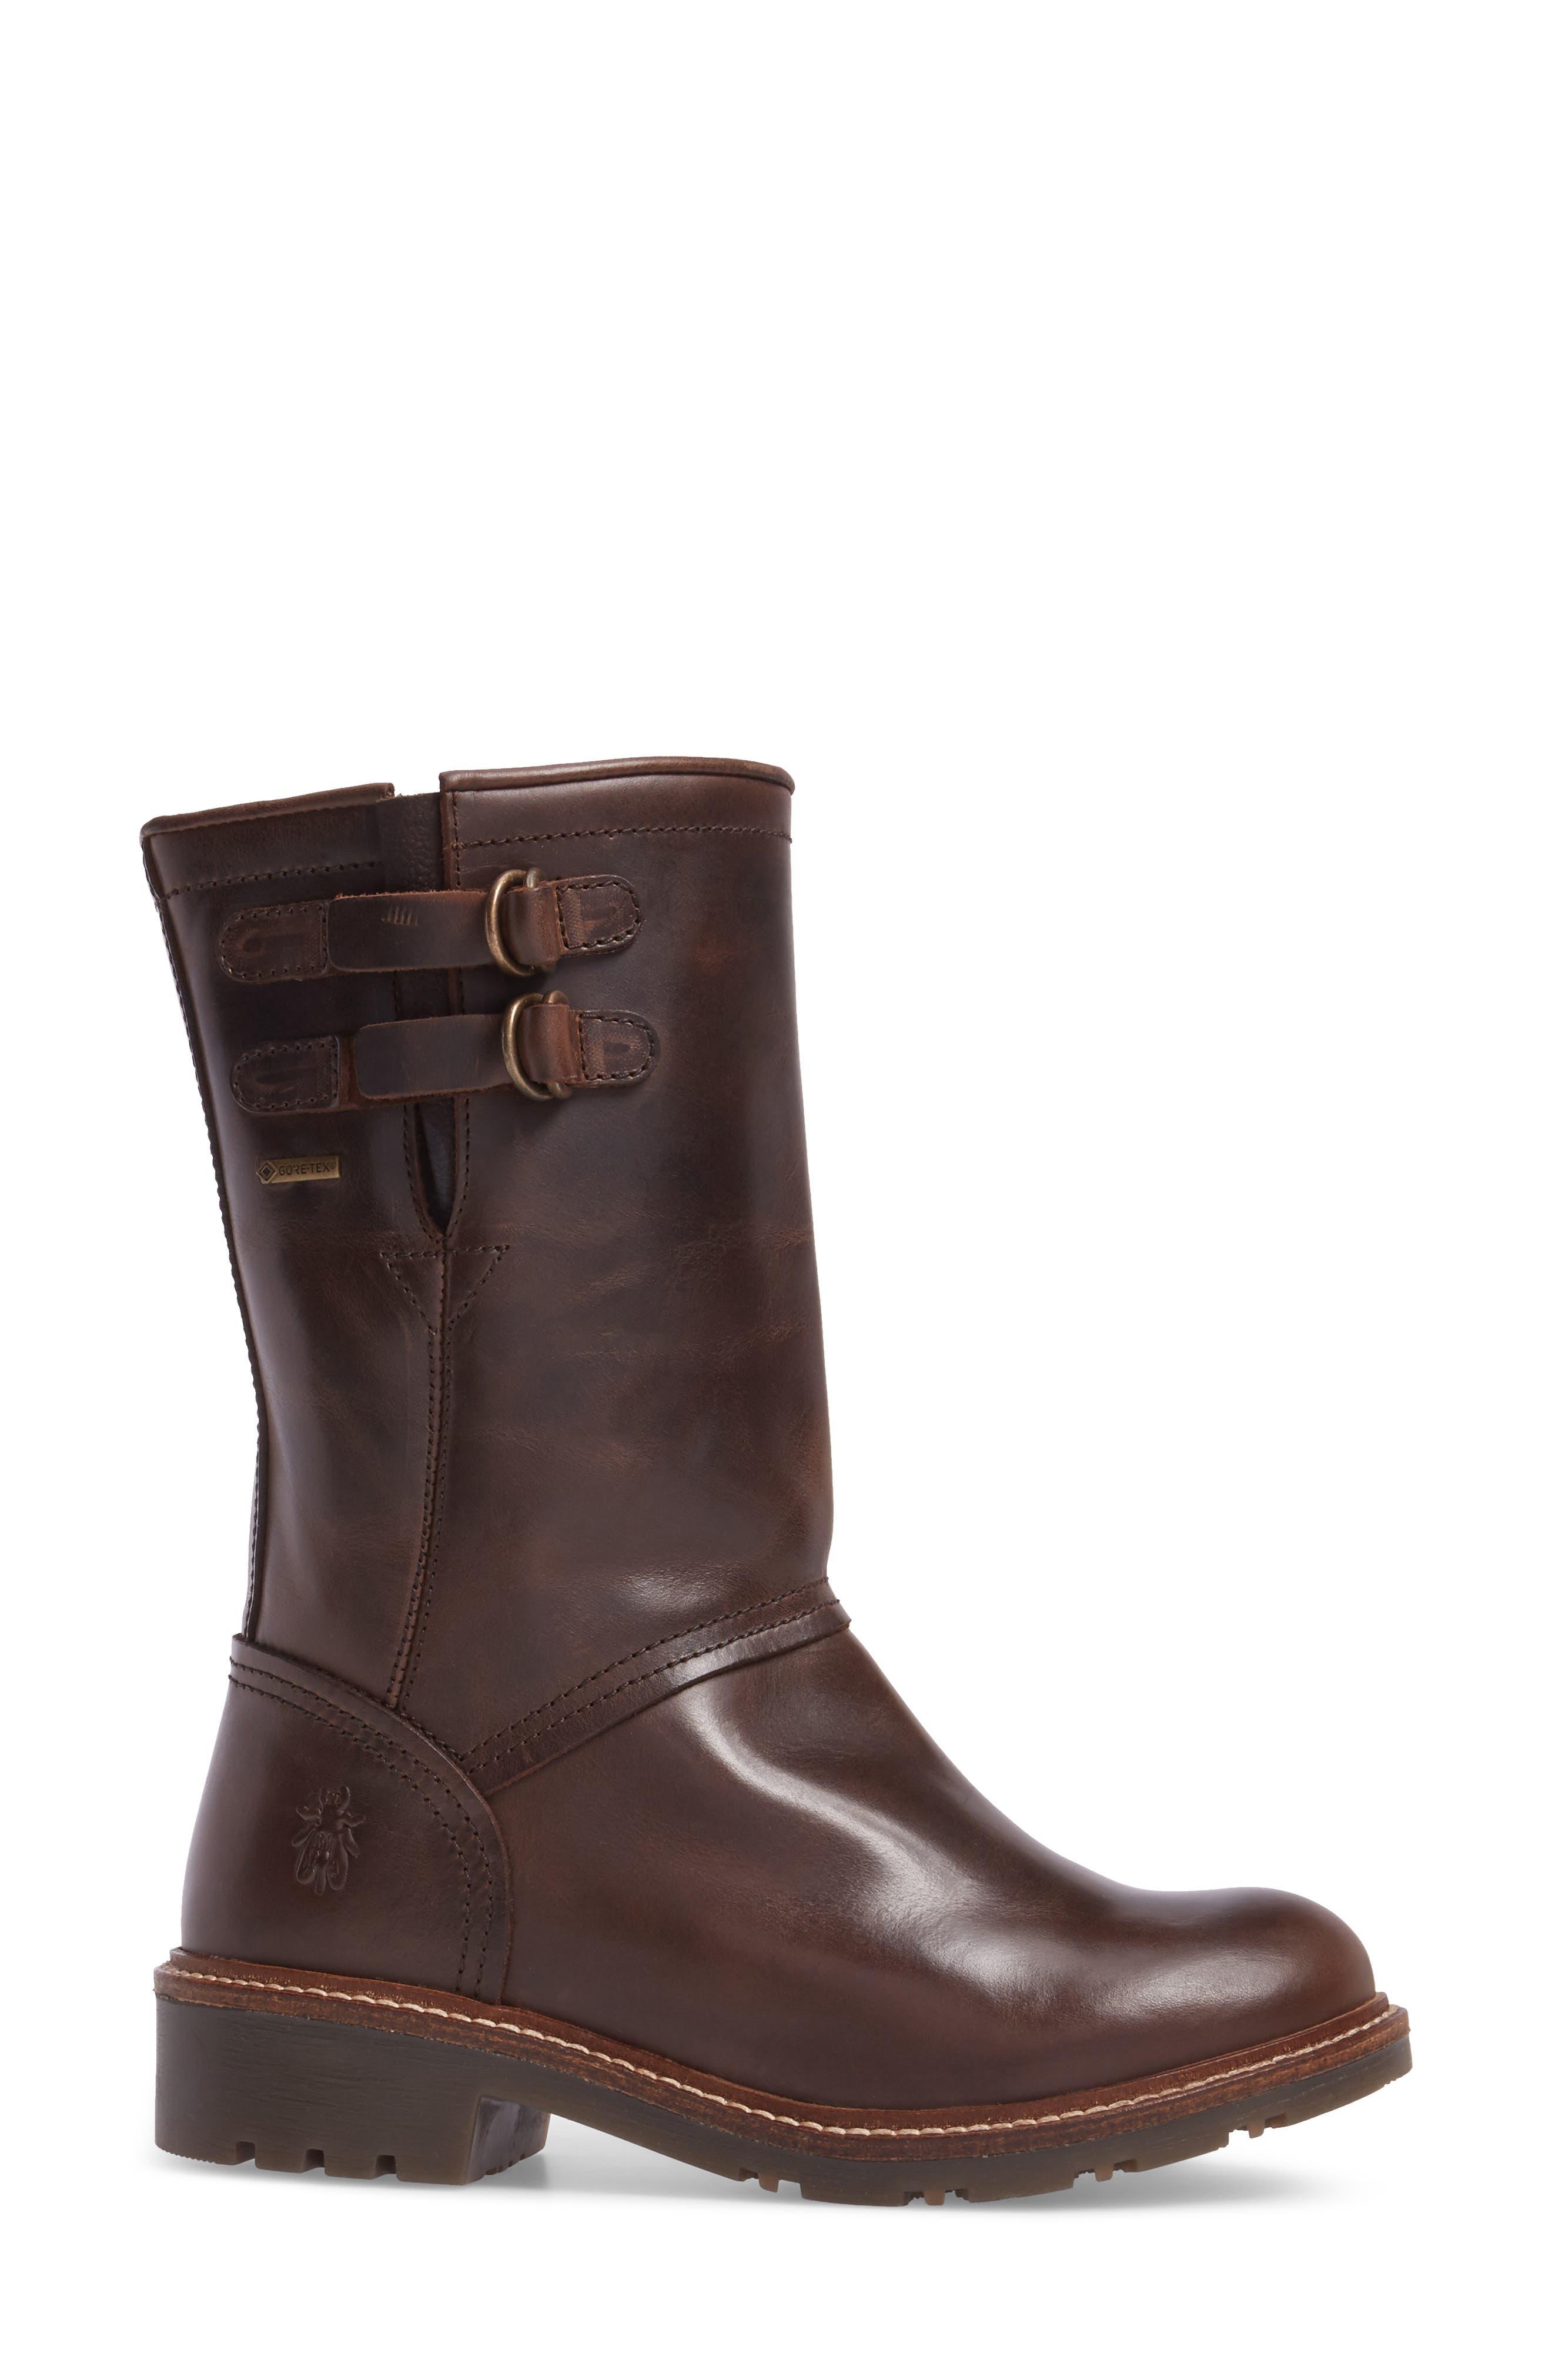 Sasi Waterproof Gore-Tex<sup>®</sup> Boot,                             Alternate thumbnail 3, color,                             Dark Brown Rug Leather